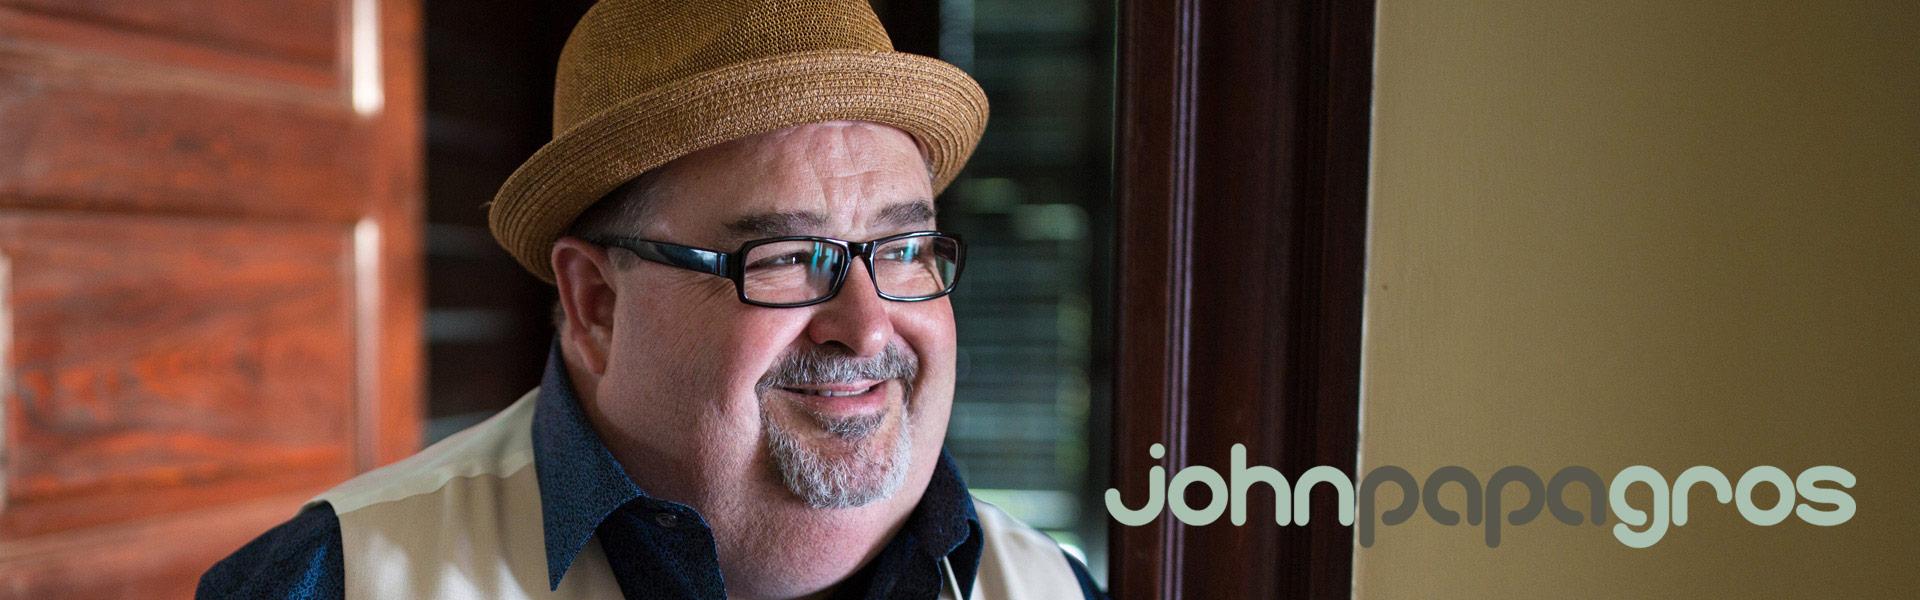 John Papa Gros